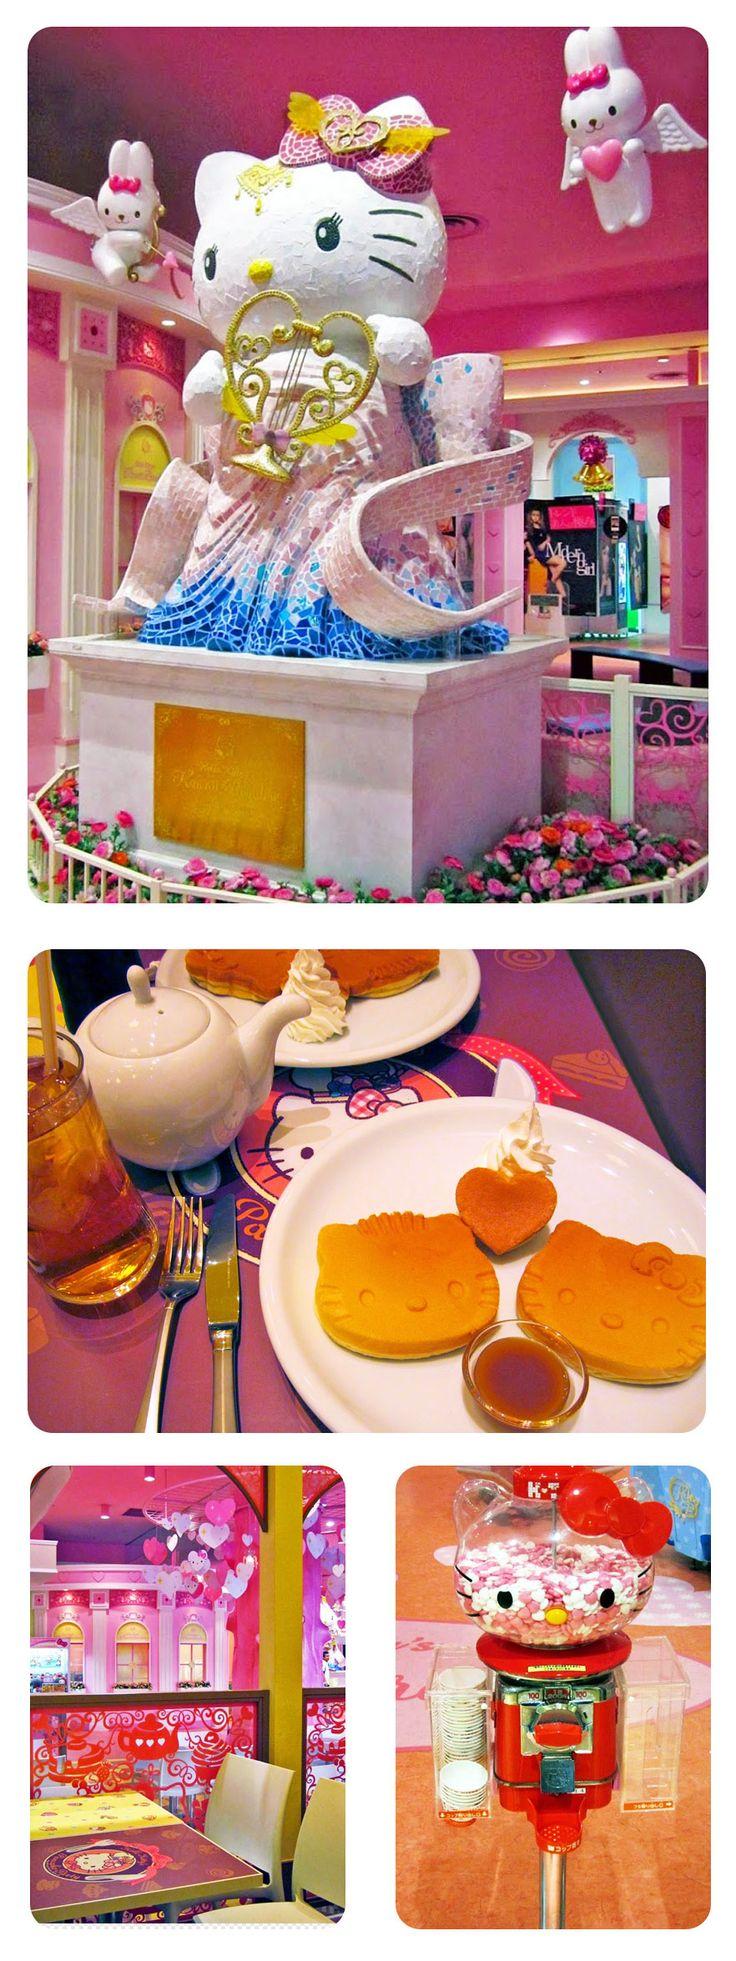 Hello Kitty's Pancake Party, Sanrio Themed Restaurant - Odaiba, Tokyo